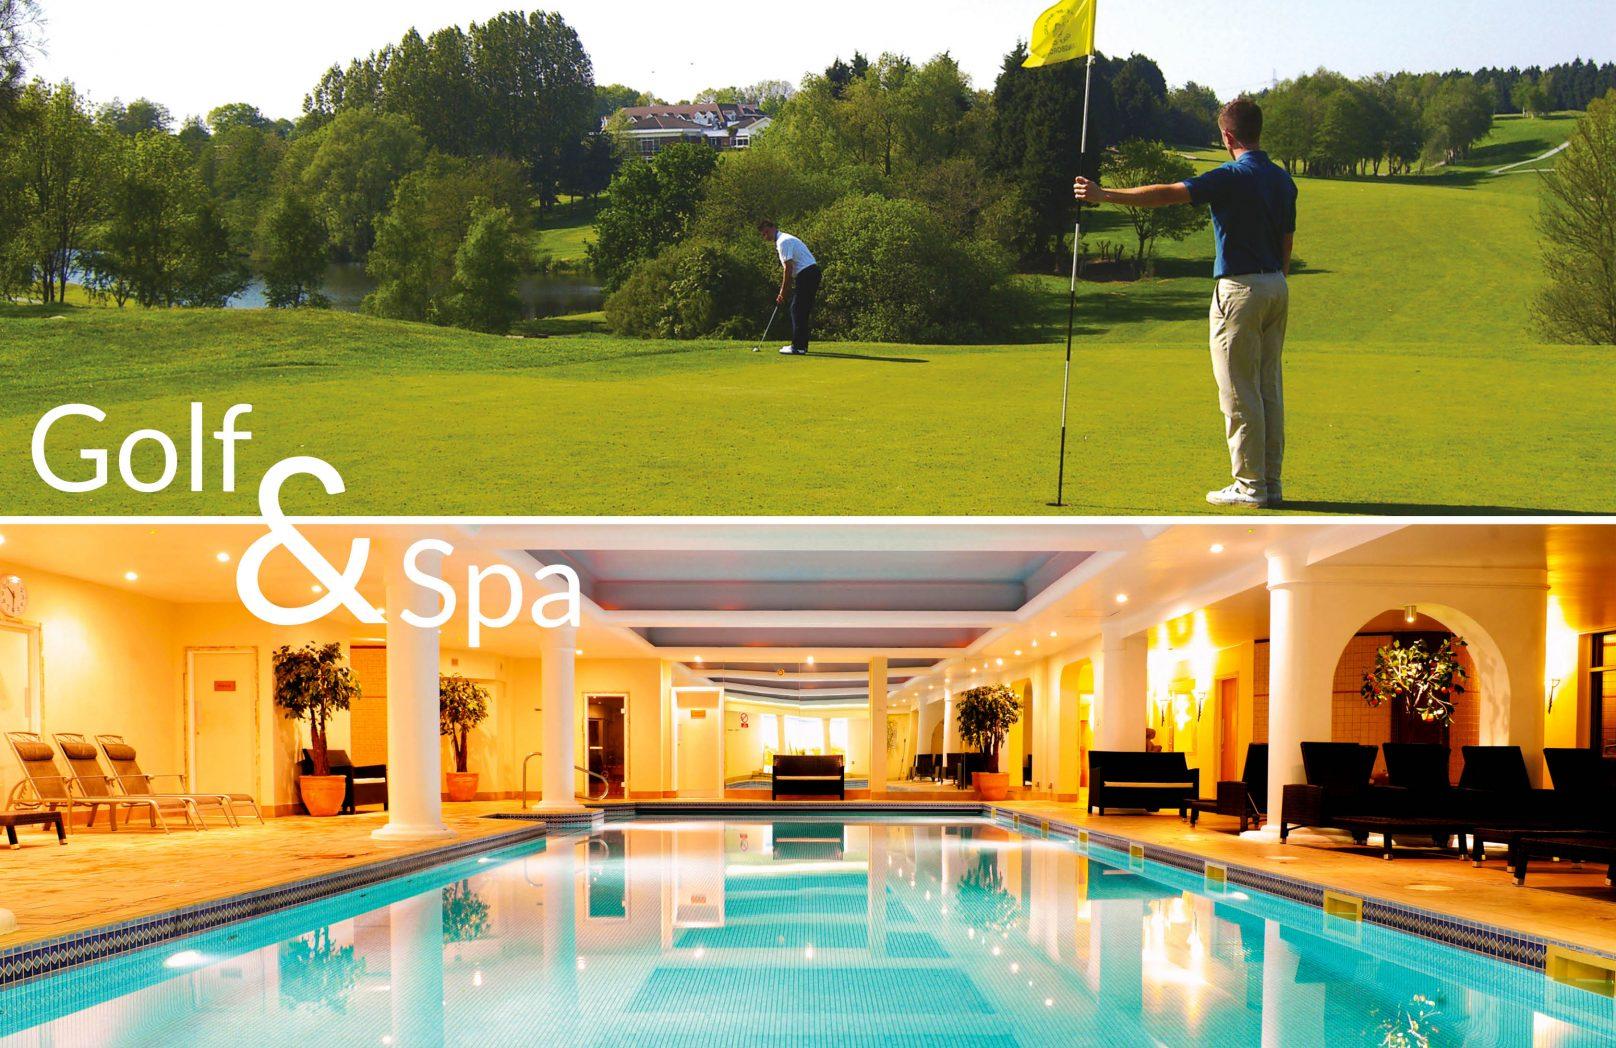 Golf & Spa Break